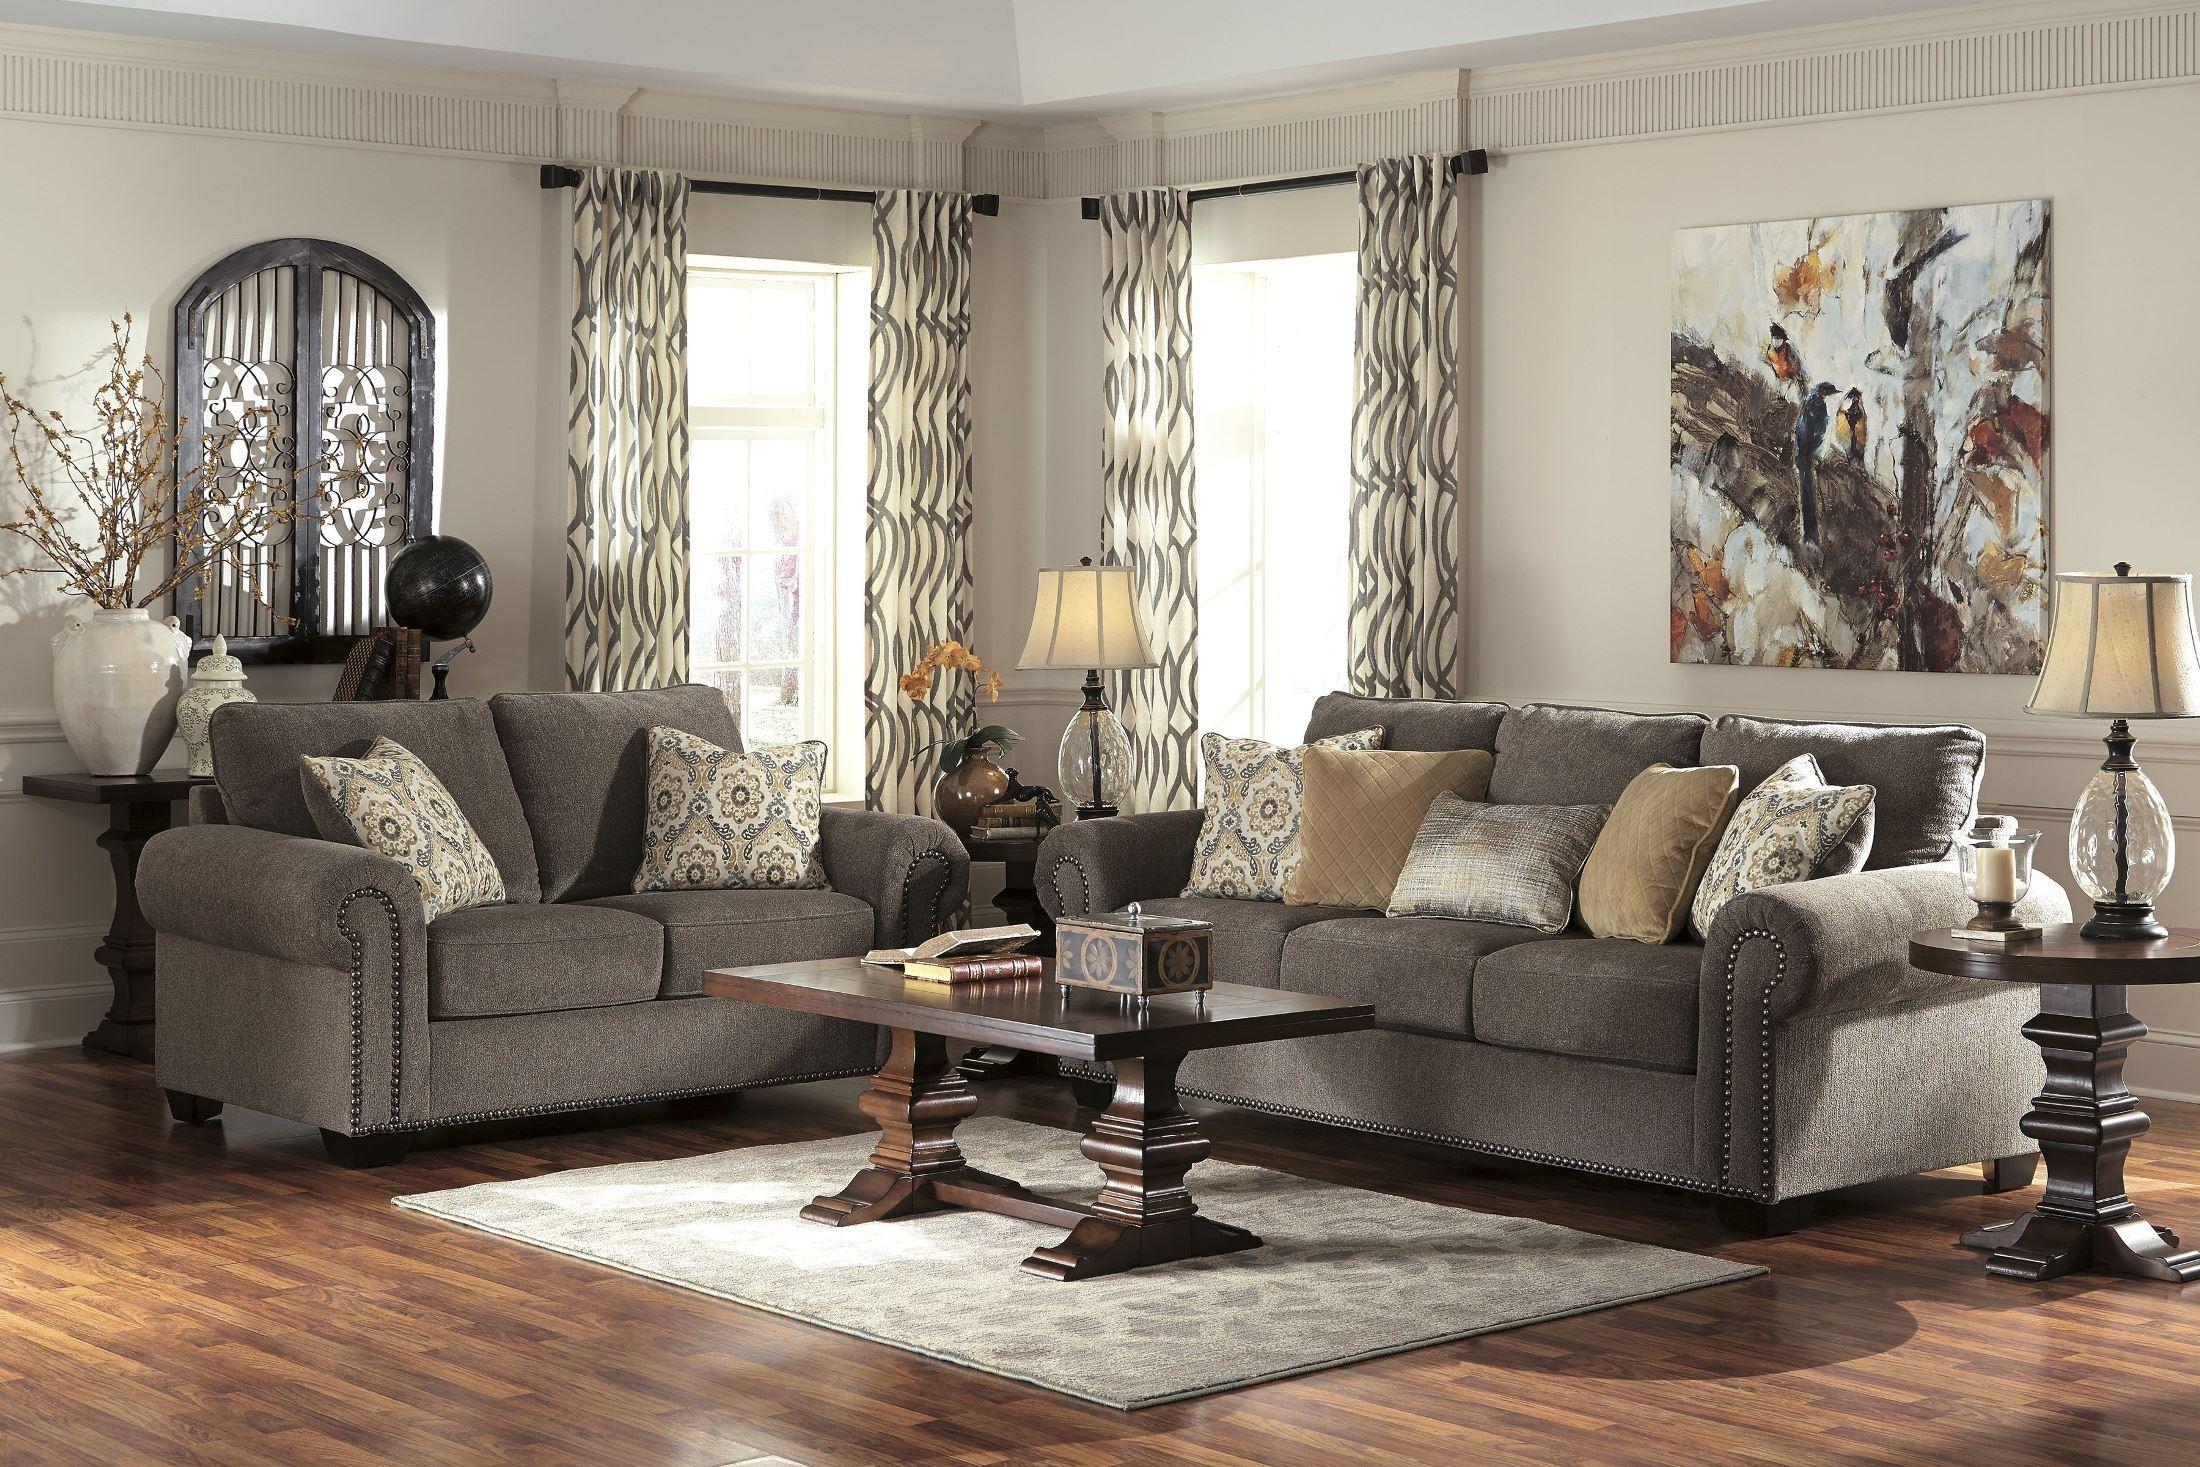 Emelen Alloy Ottoman From Ashley 4560014 Coleman Furniture